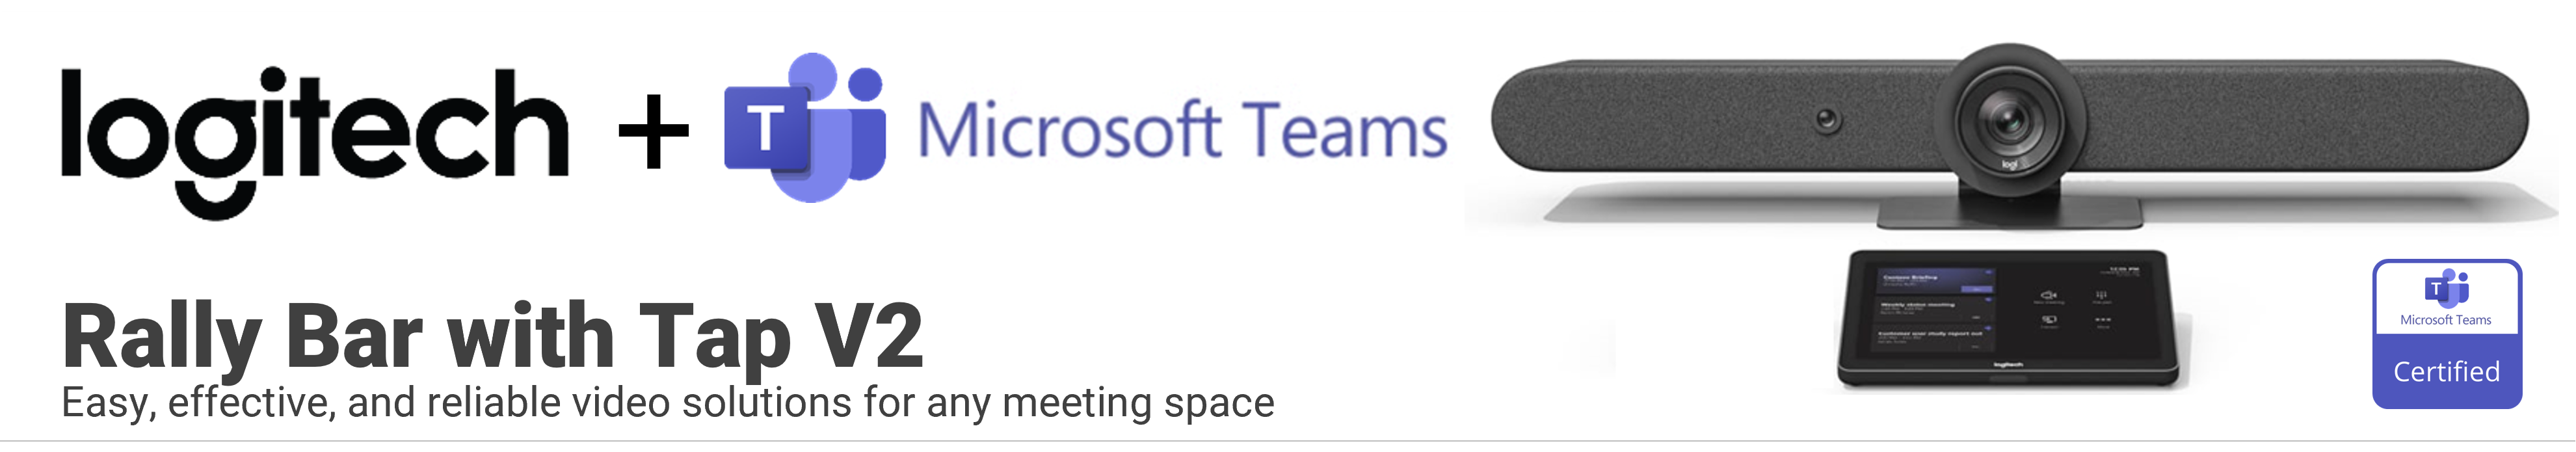 Logitech Rally Bar Microsoft Teams Kit